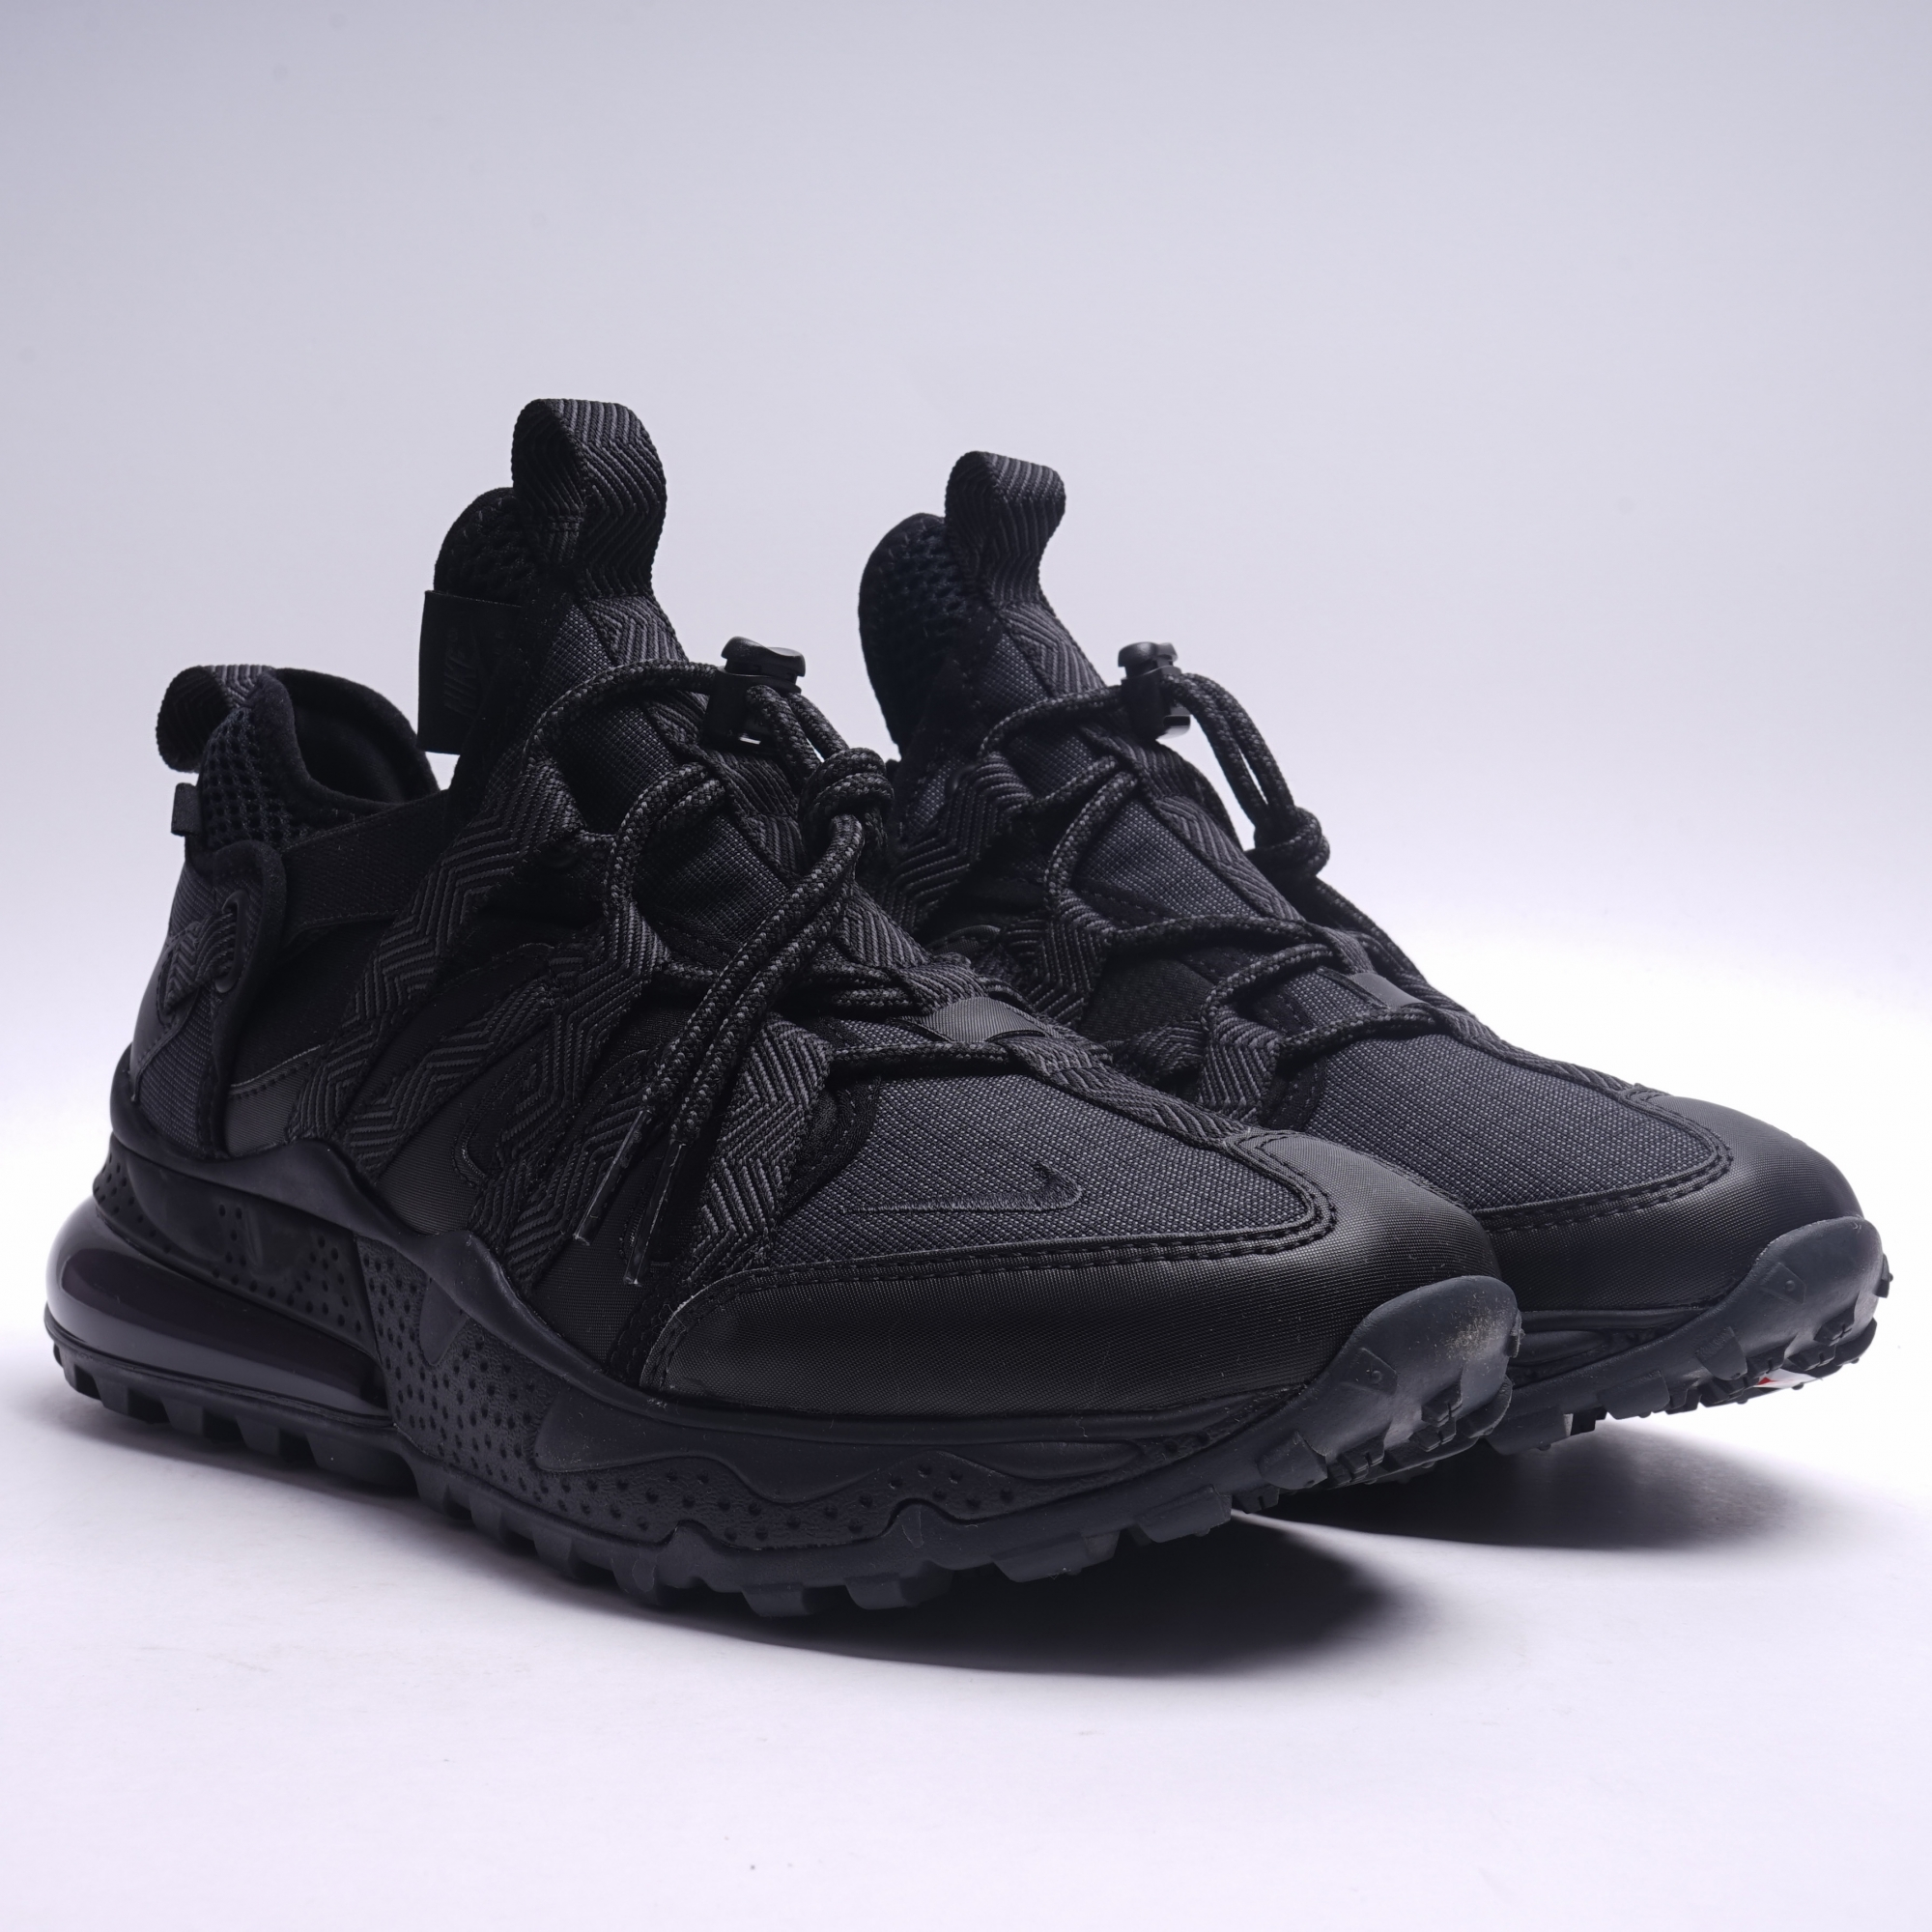 Nike Air Max 270 Bowfin BLACK ANTHRACITE-BLACK - Slash Store 52f0103a0